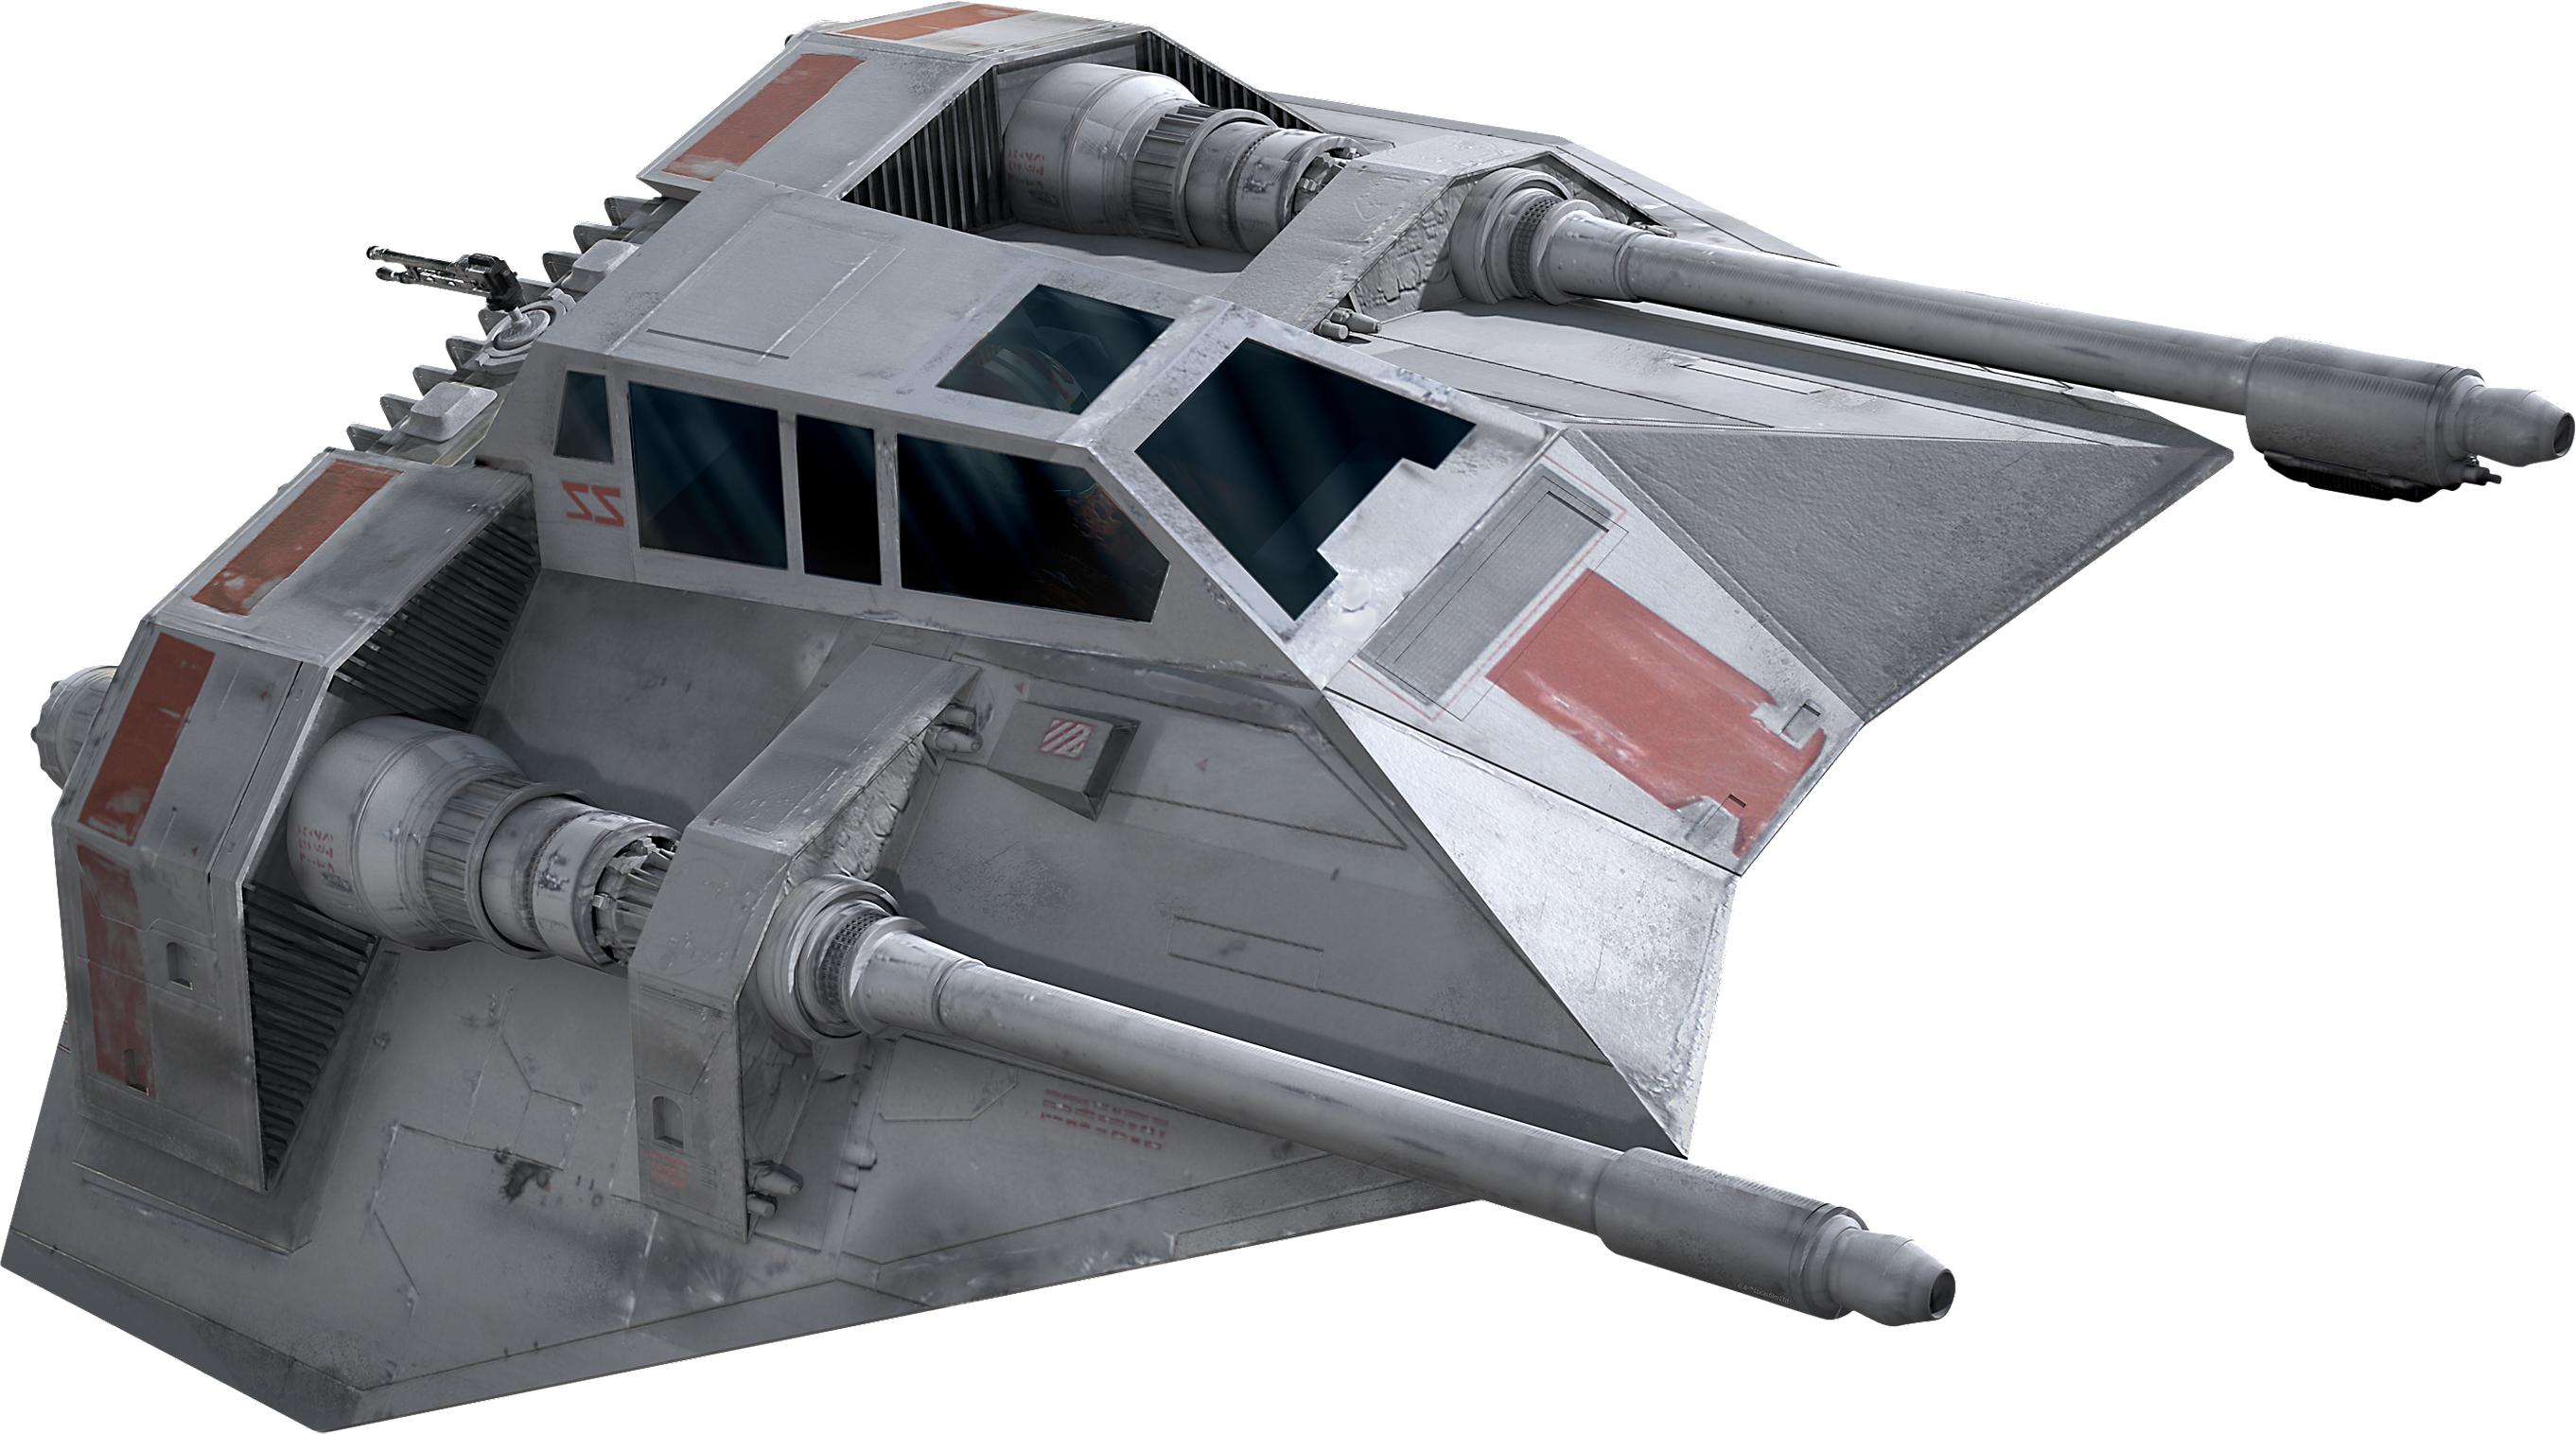 Star Wars Star Wars Images Star Wars Vehicles Star Wars Ships